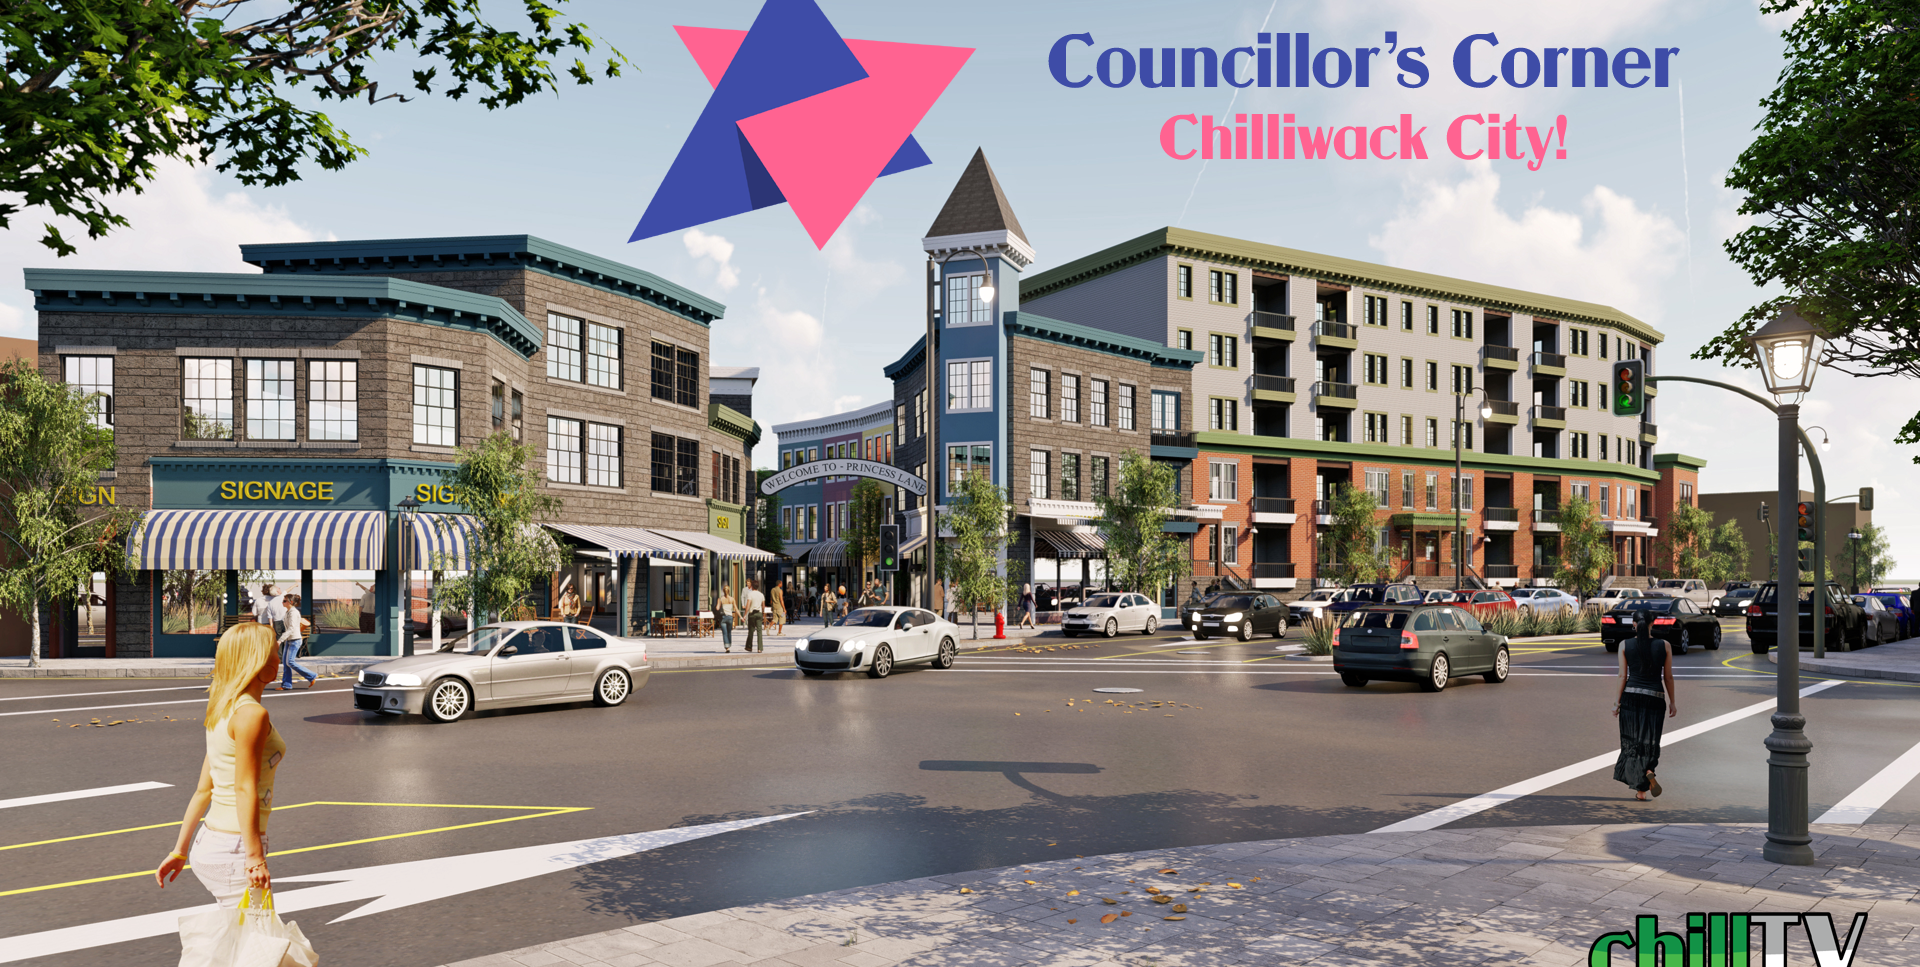 Councillor's Corner